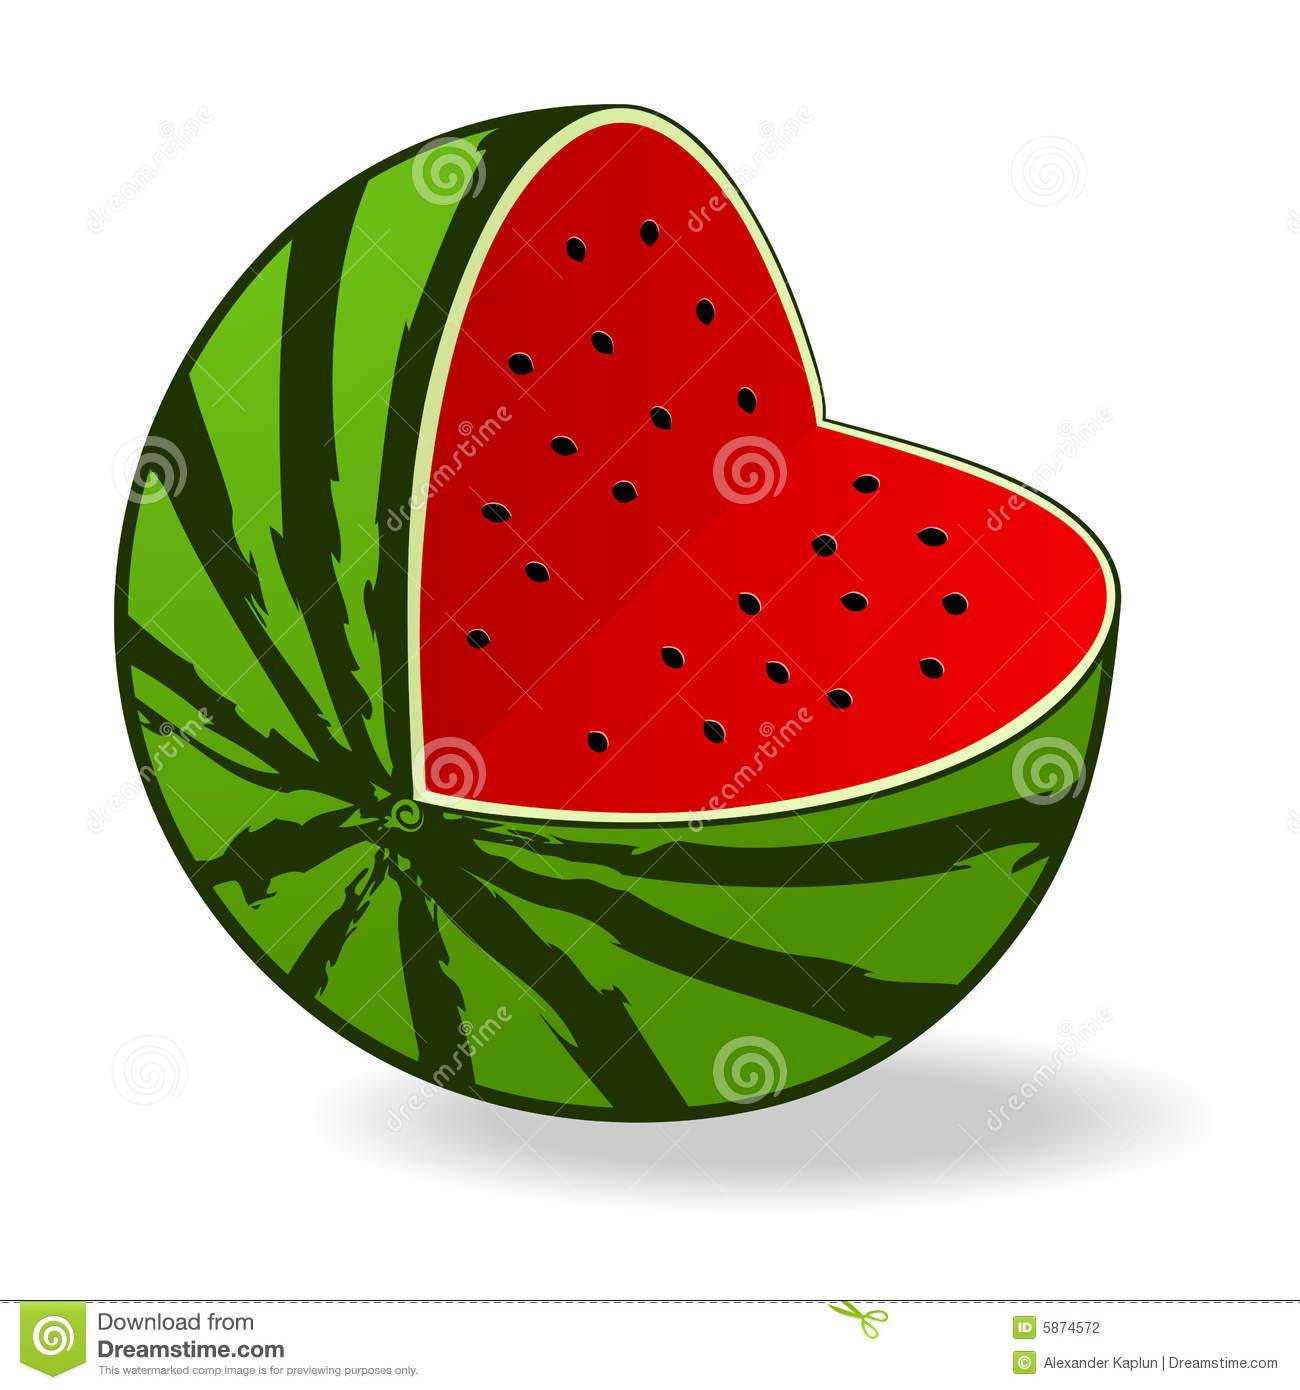 Watermelon Cartoon Clipart - Clipart Suggest